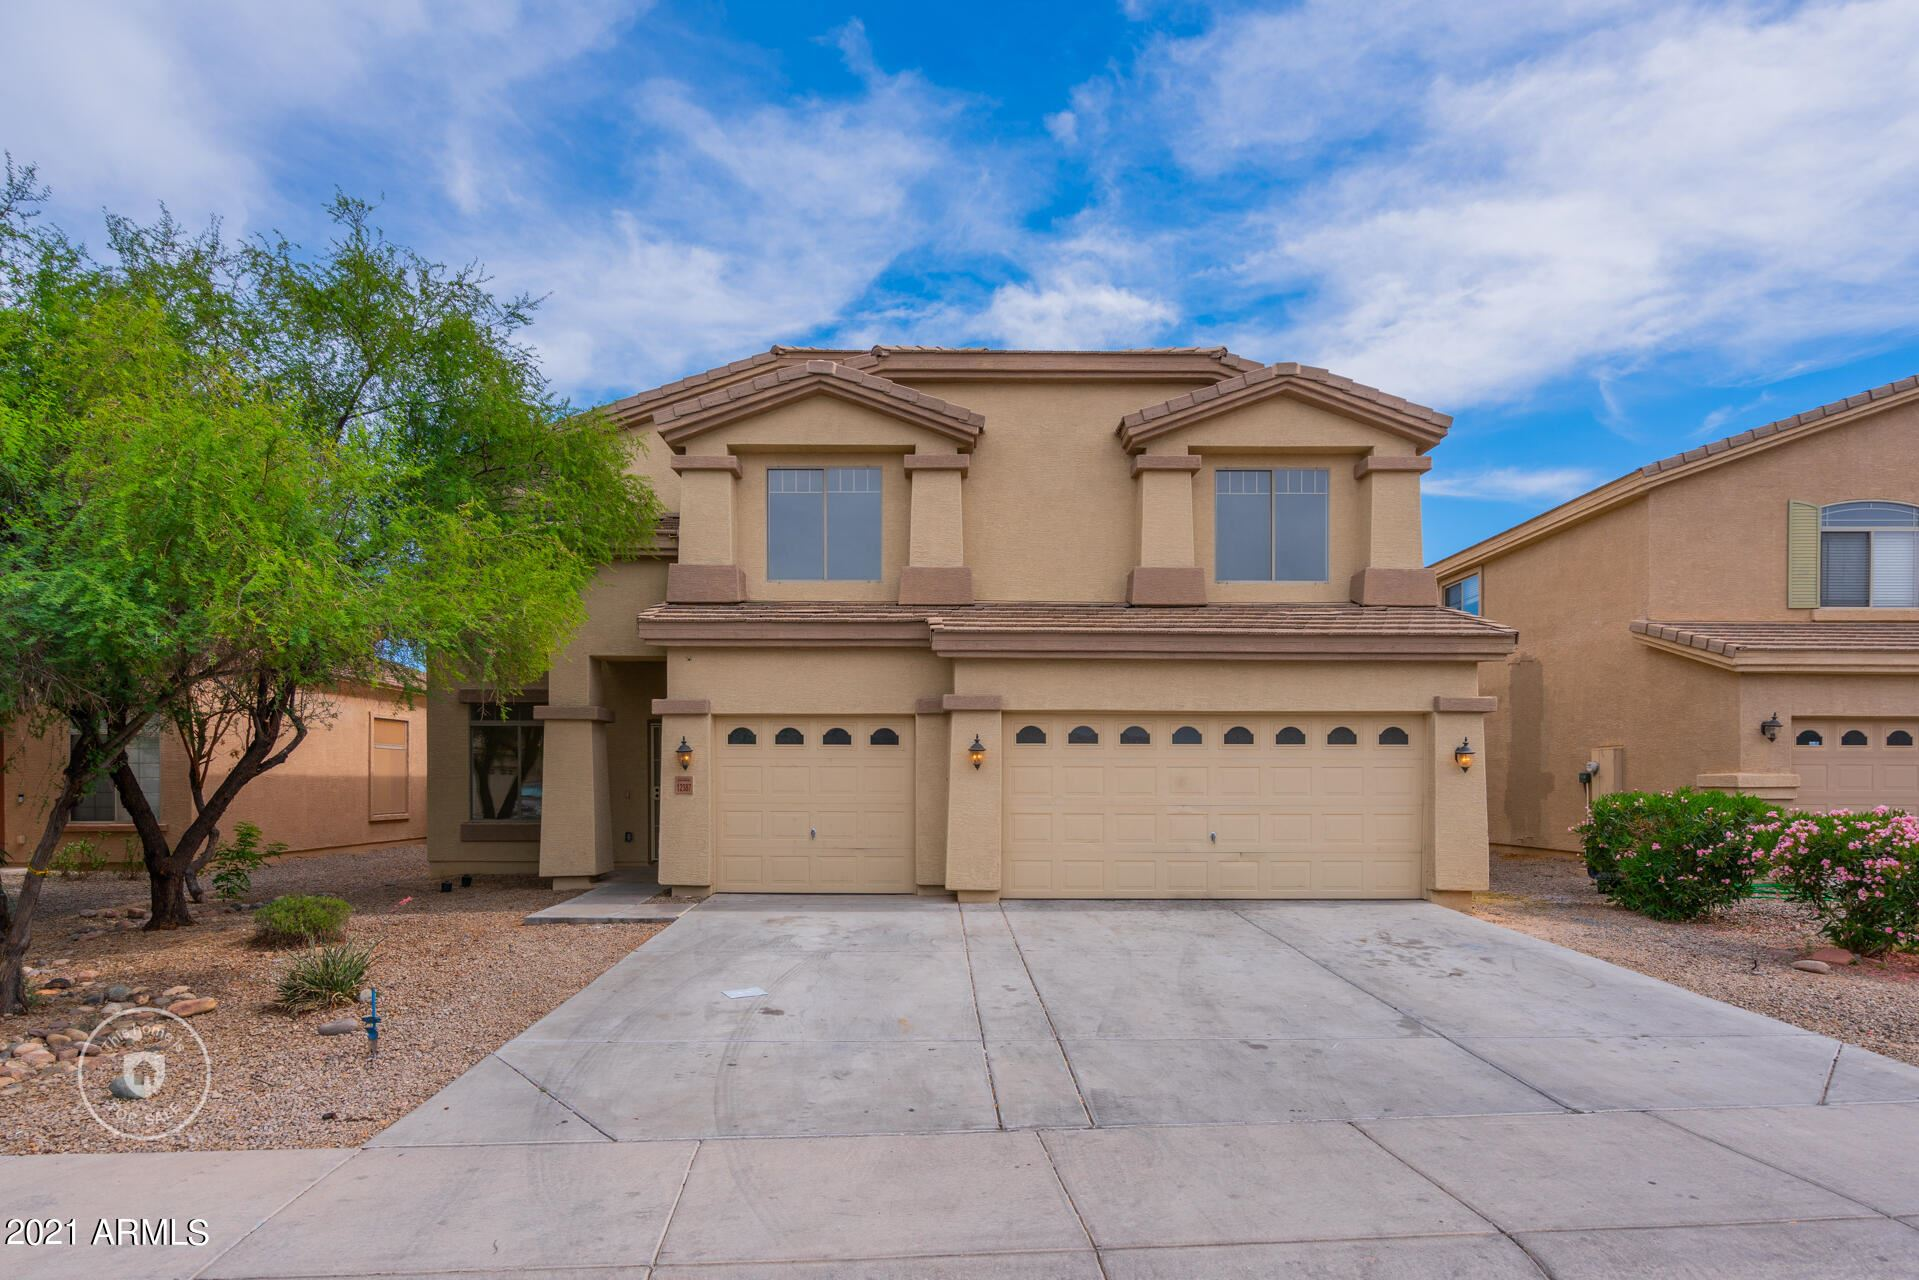 12387 W CAMPBELL Avenue, Avondale, AZ 85392 - MLS#: 6241358